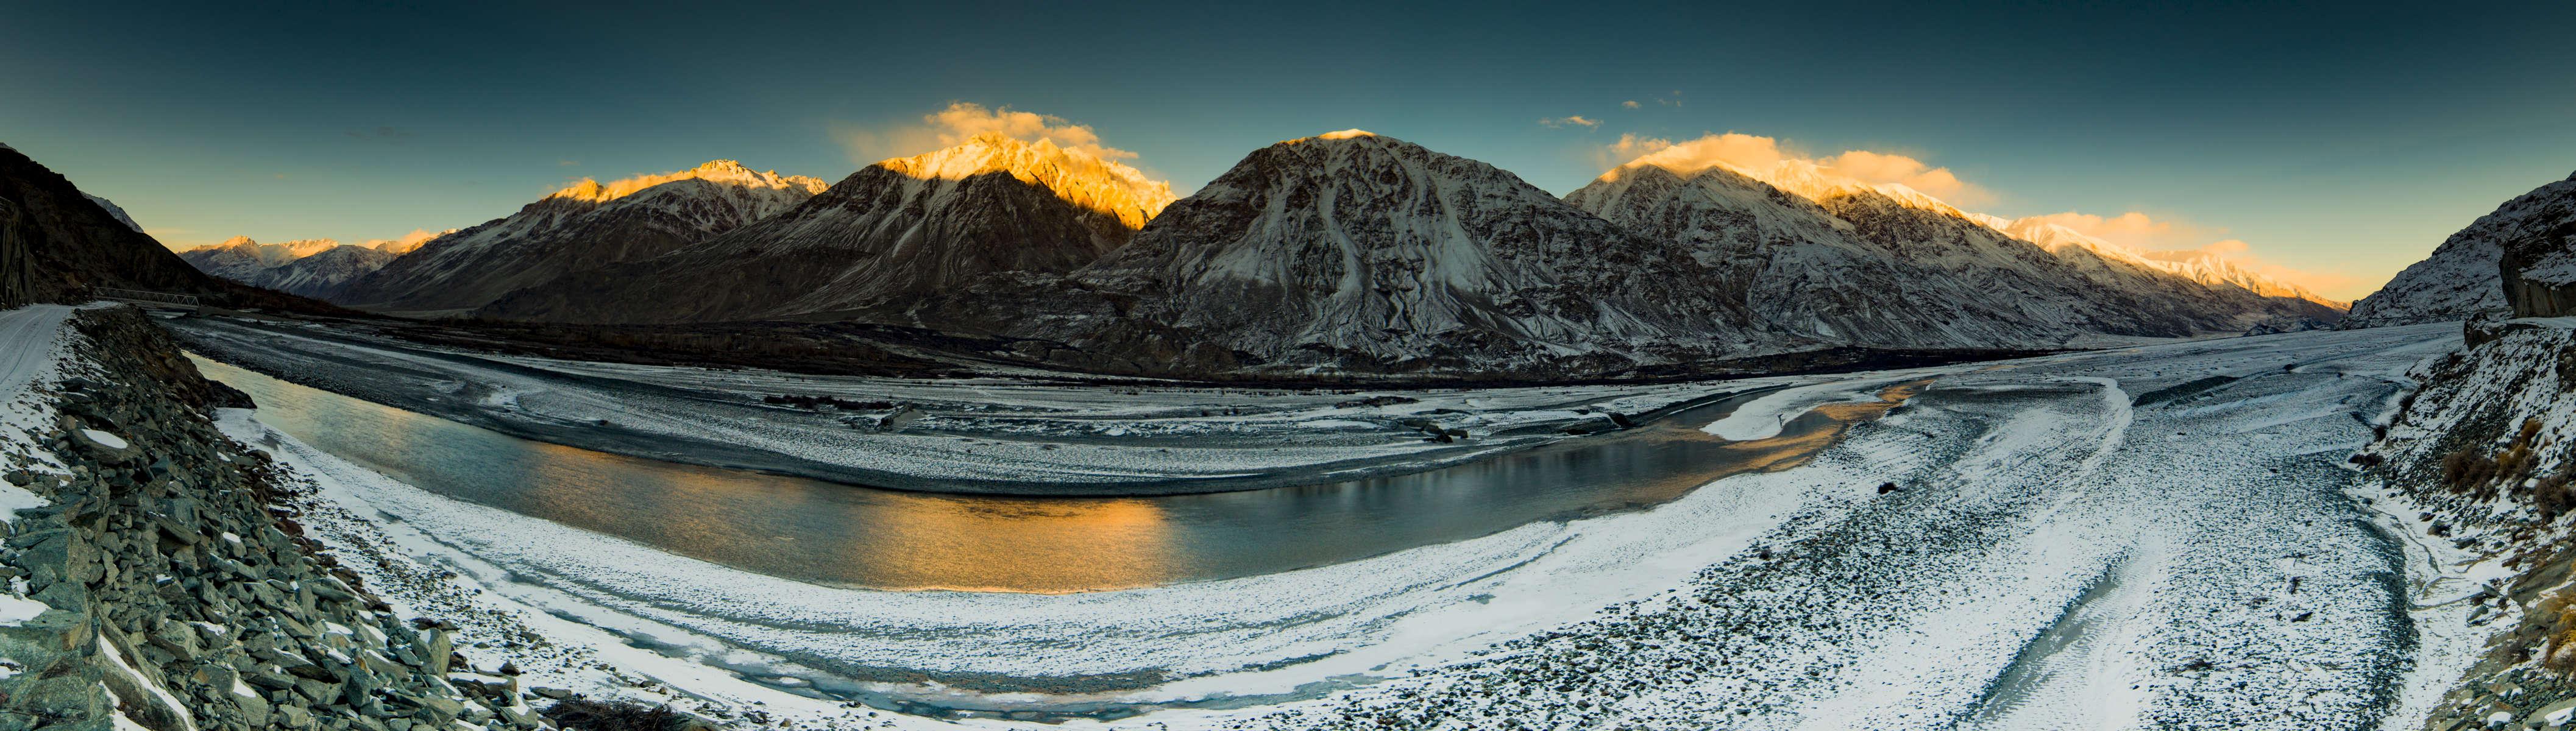 20170209-Ladakh-Winter-2017-4